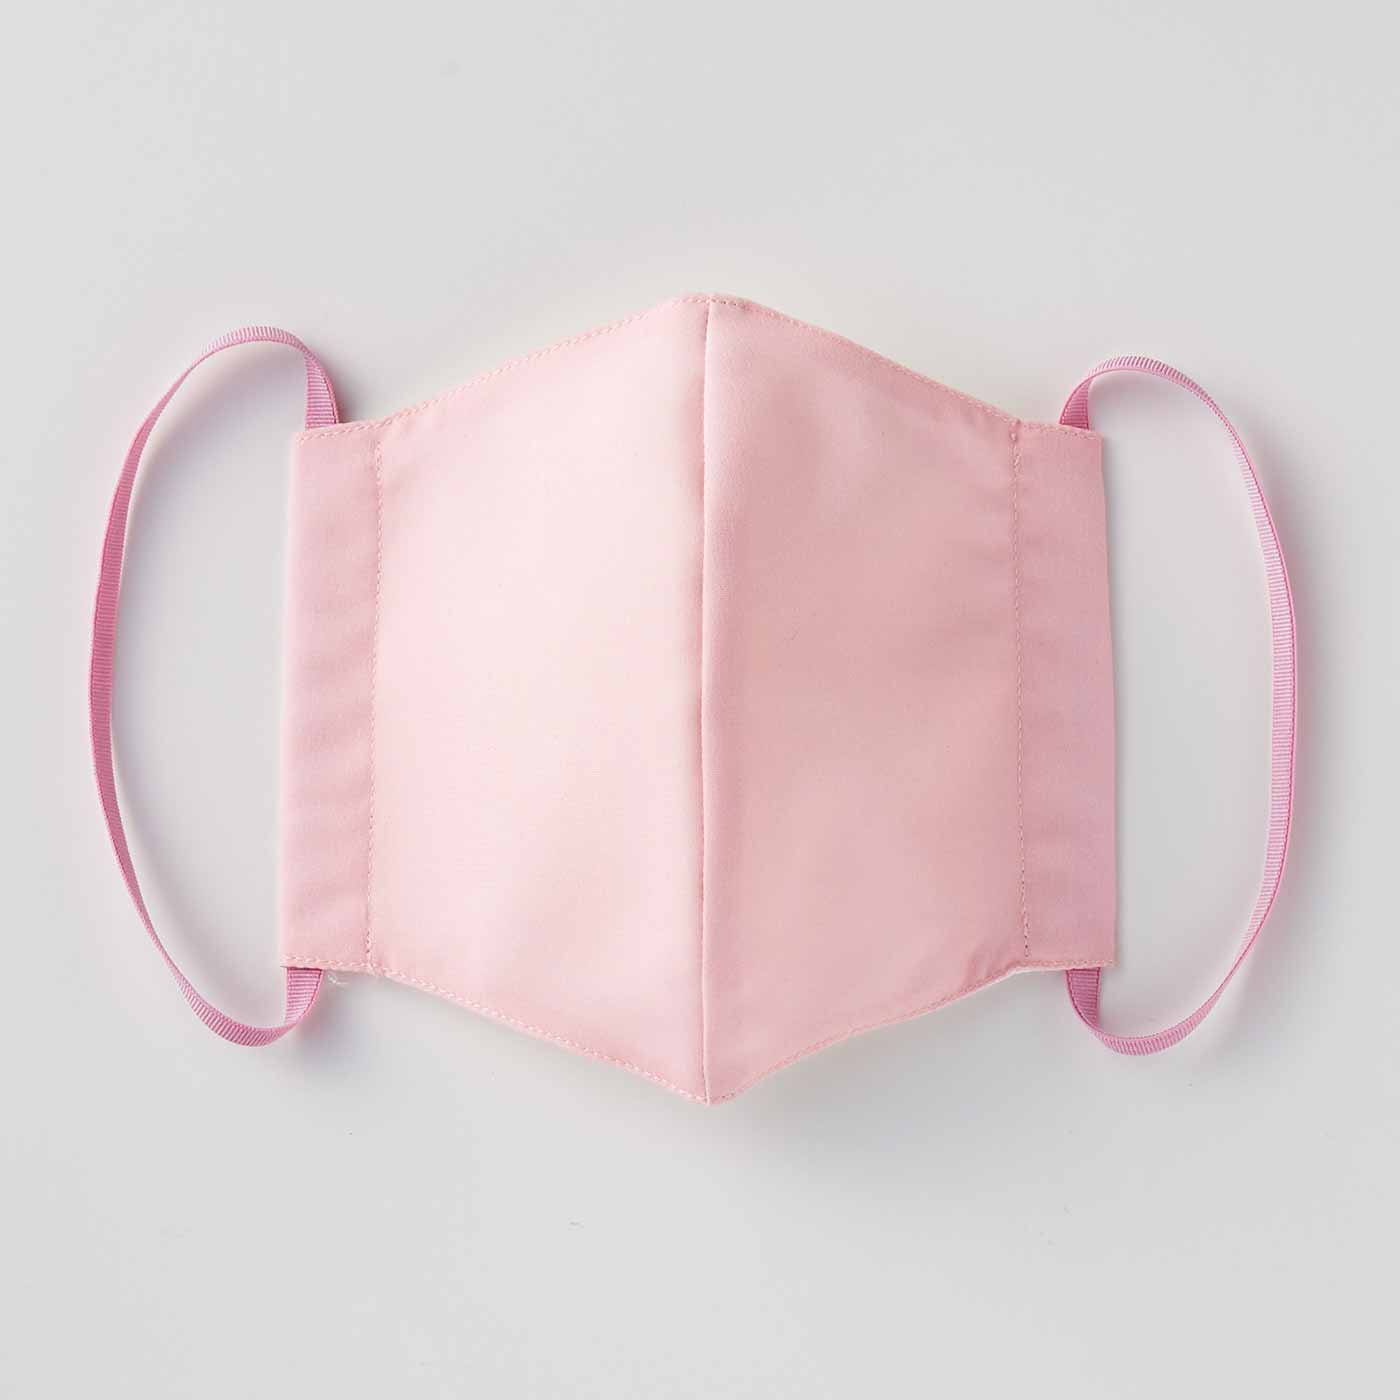 OSYAIRO UVカットのキレイカラーマスク〈ピンク〉